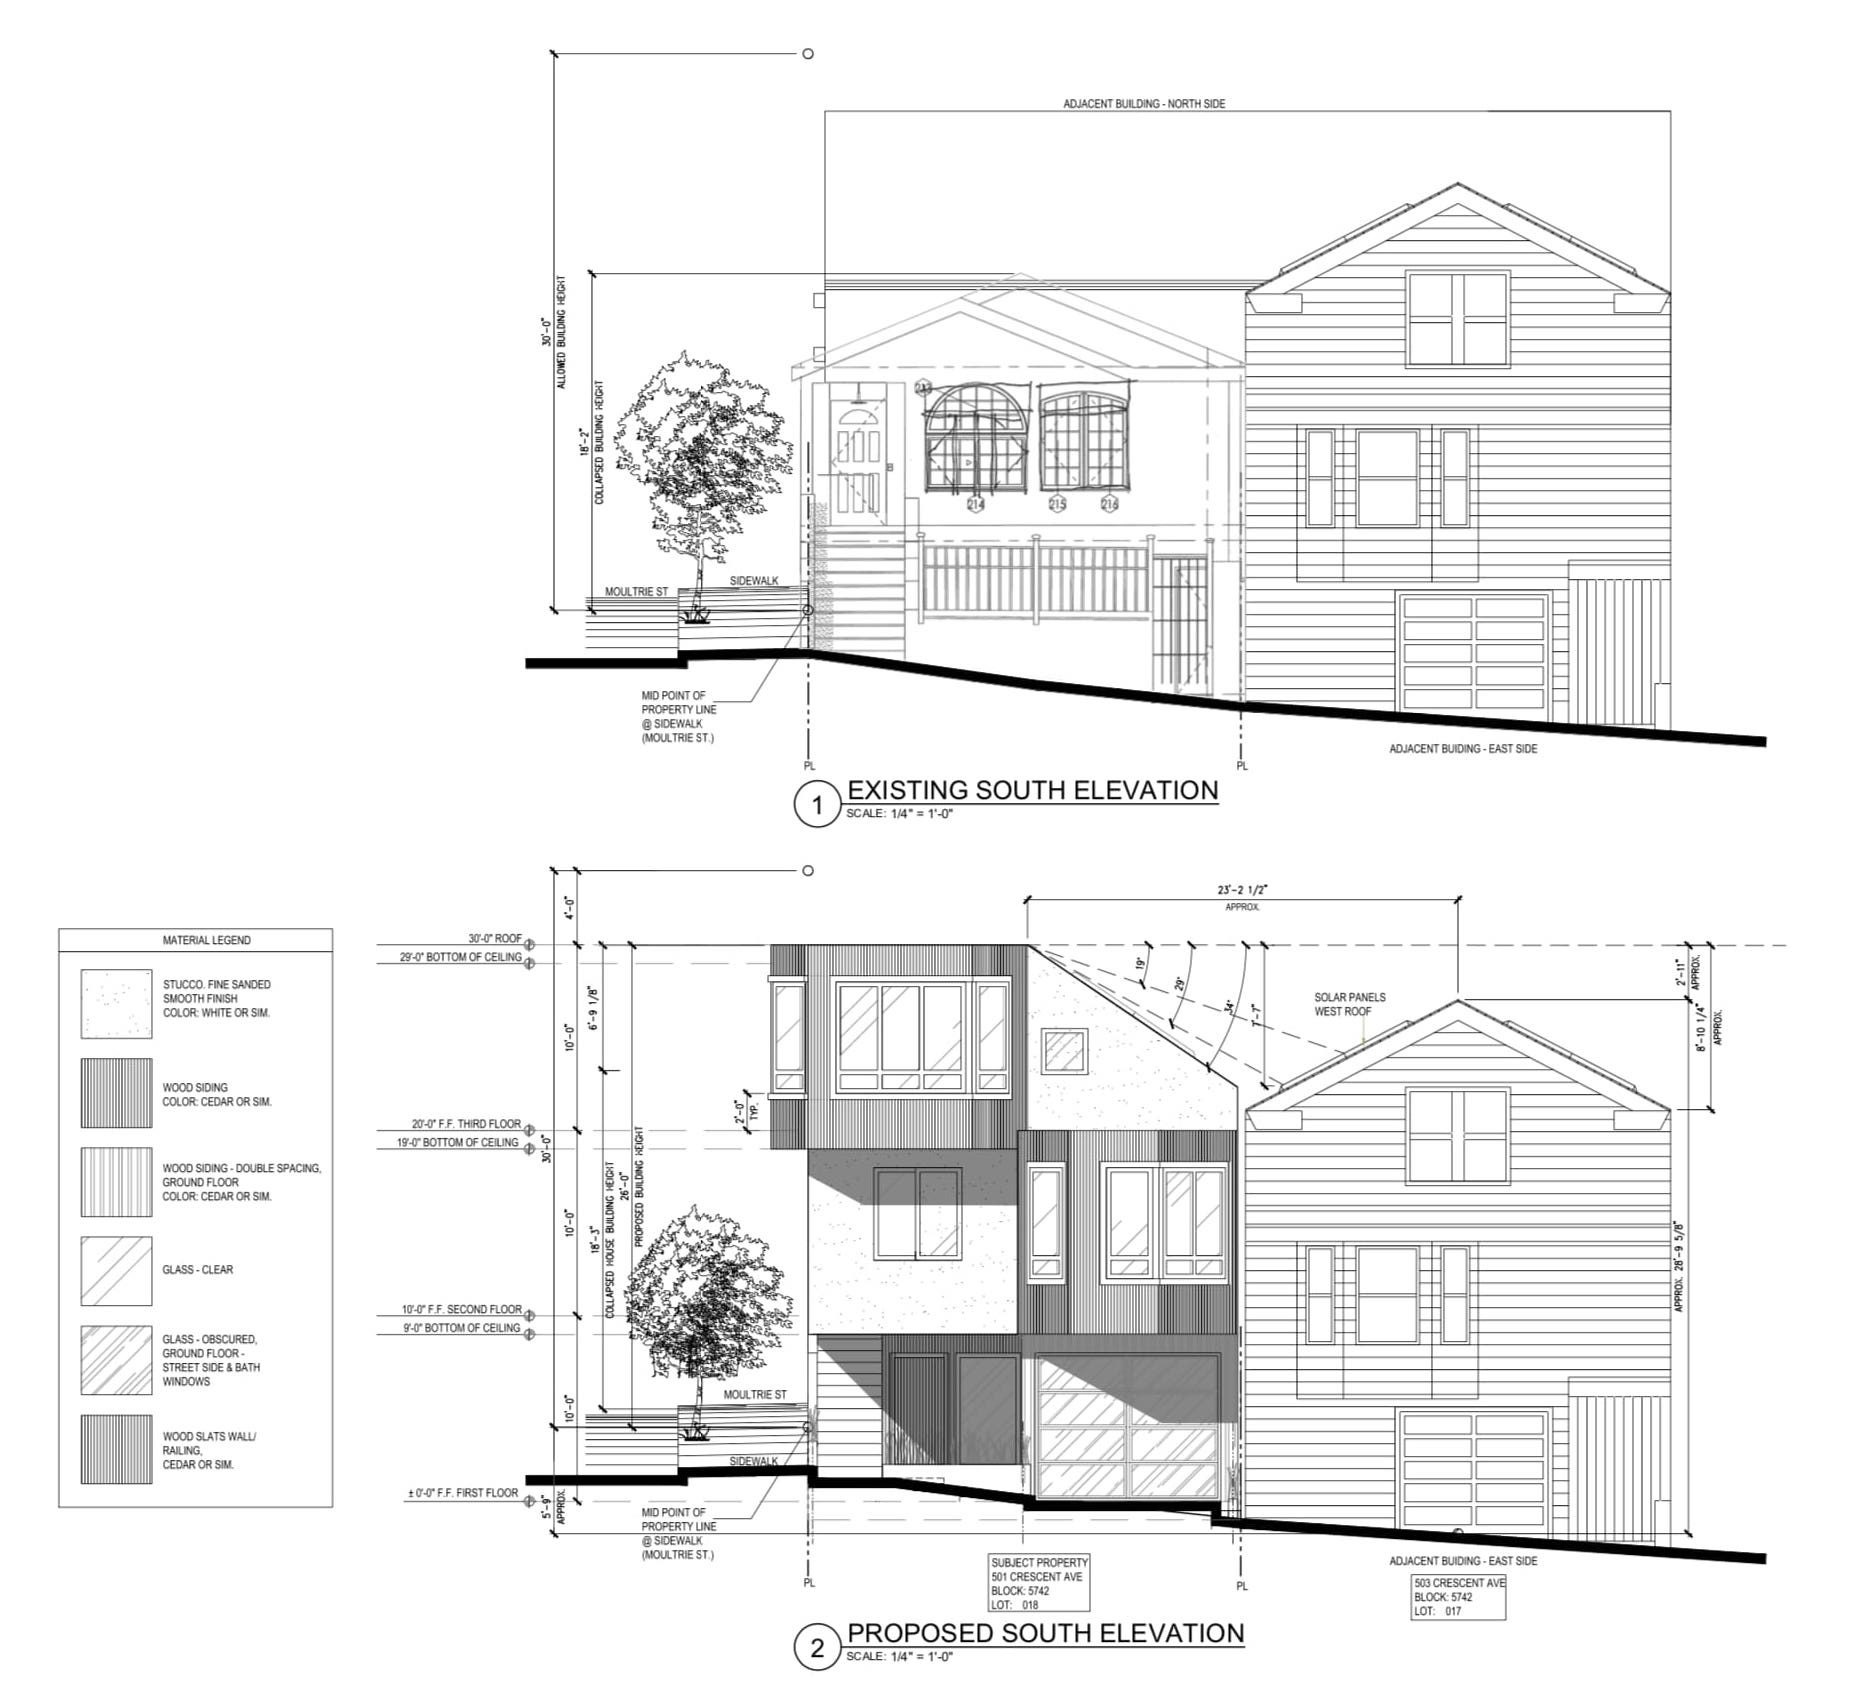 501 Crescent Avenue South Elevations via CityDot Studio